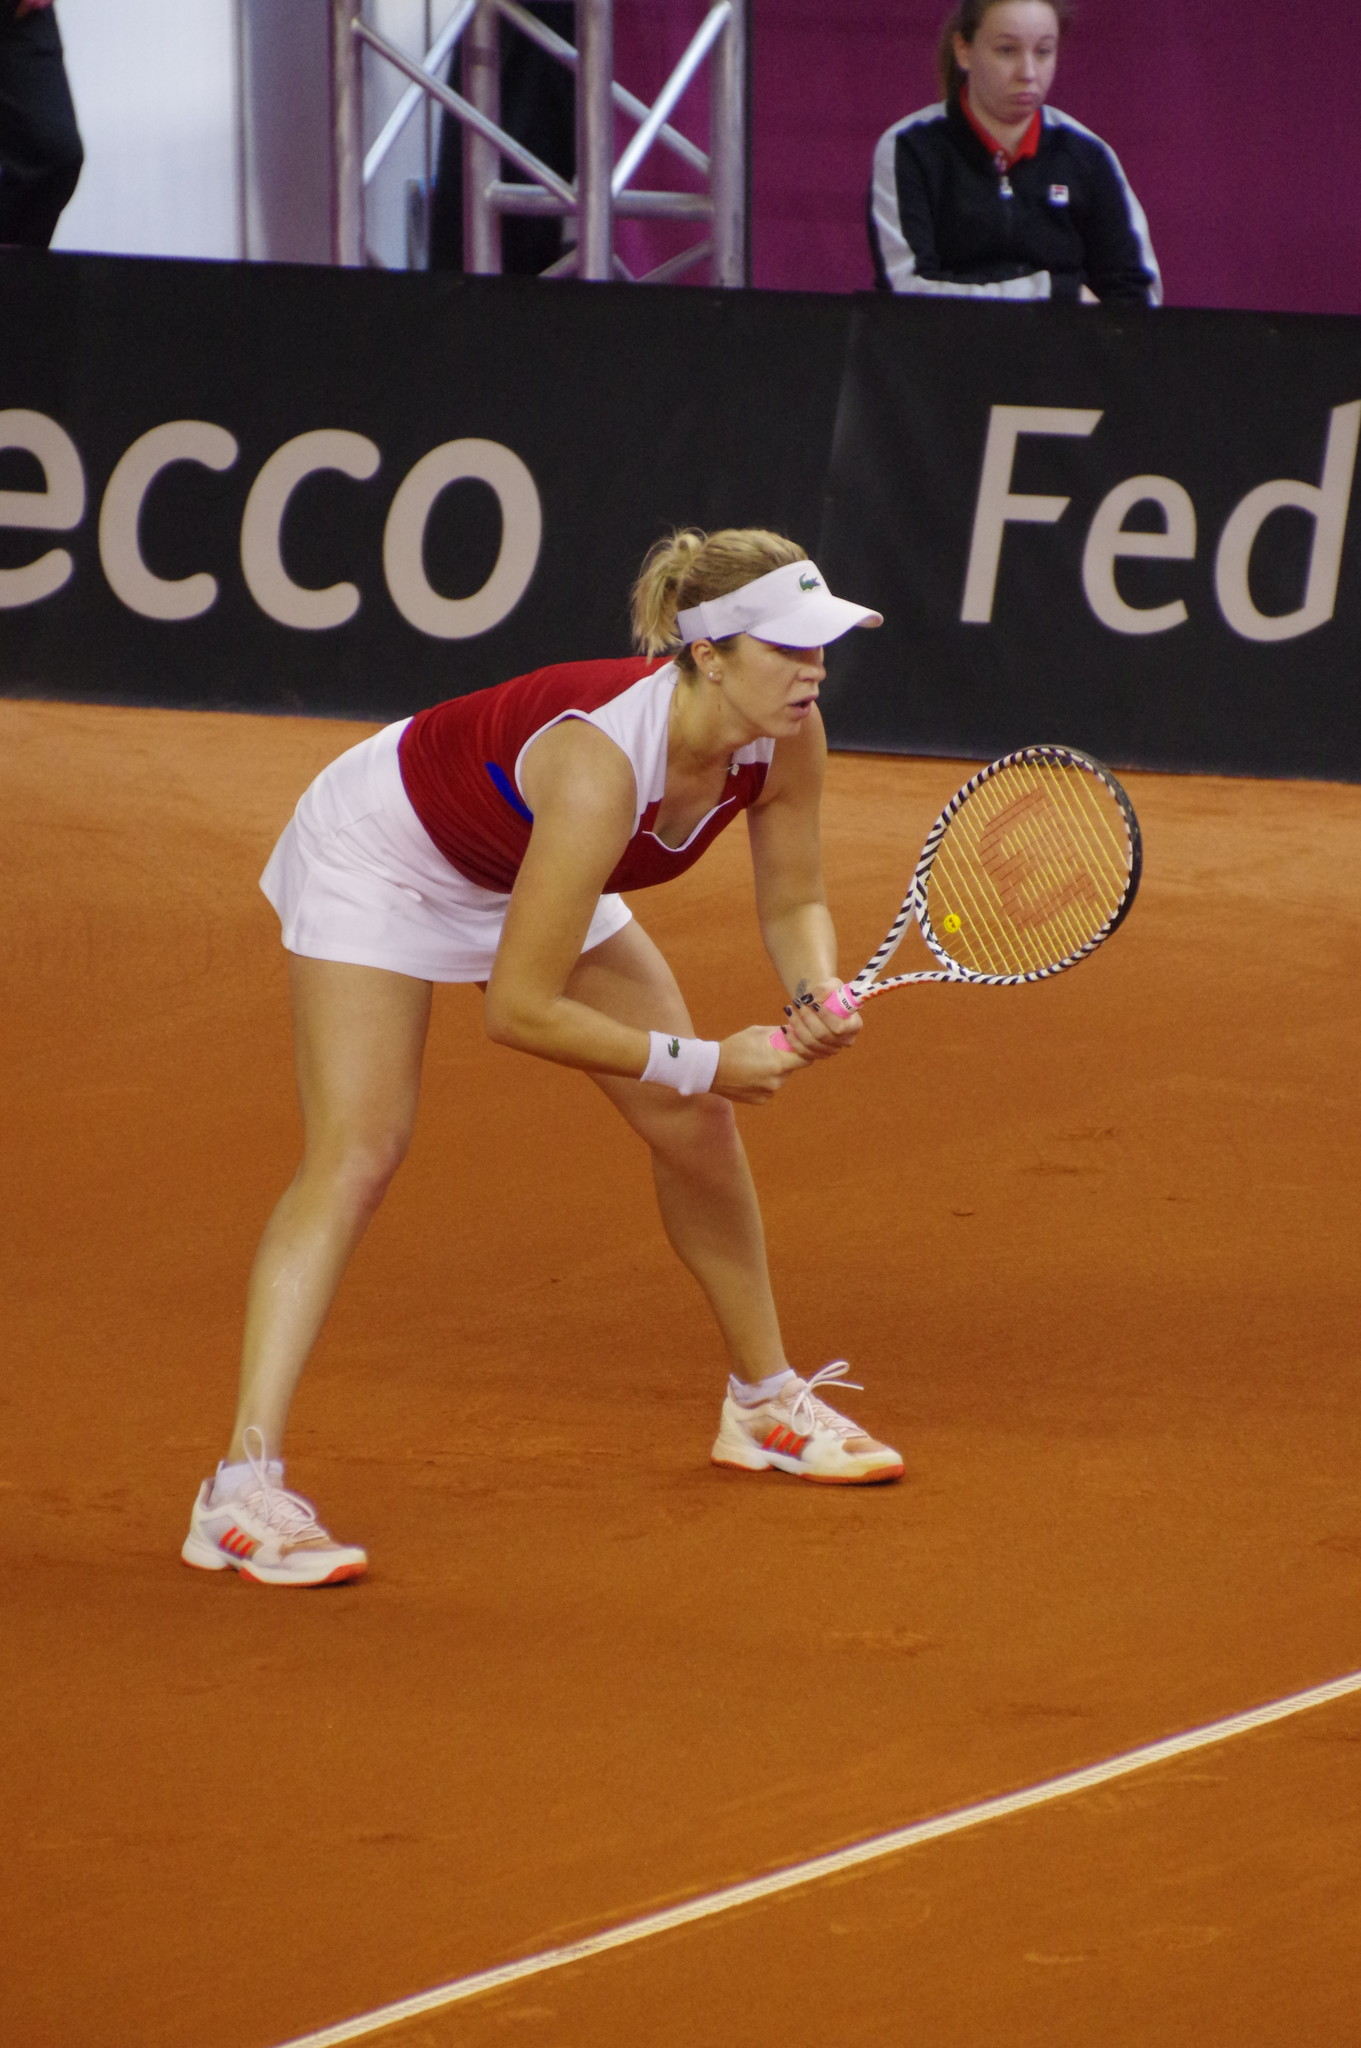 Мастер спорта международного класса Анастасия Сергеевна Павлюченкова